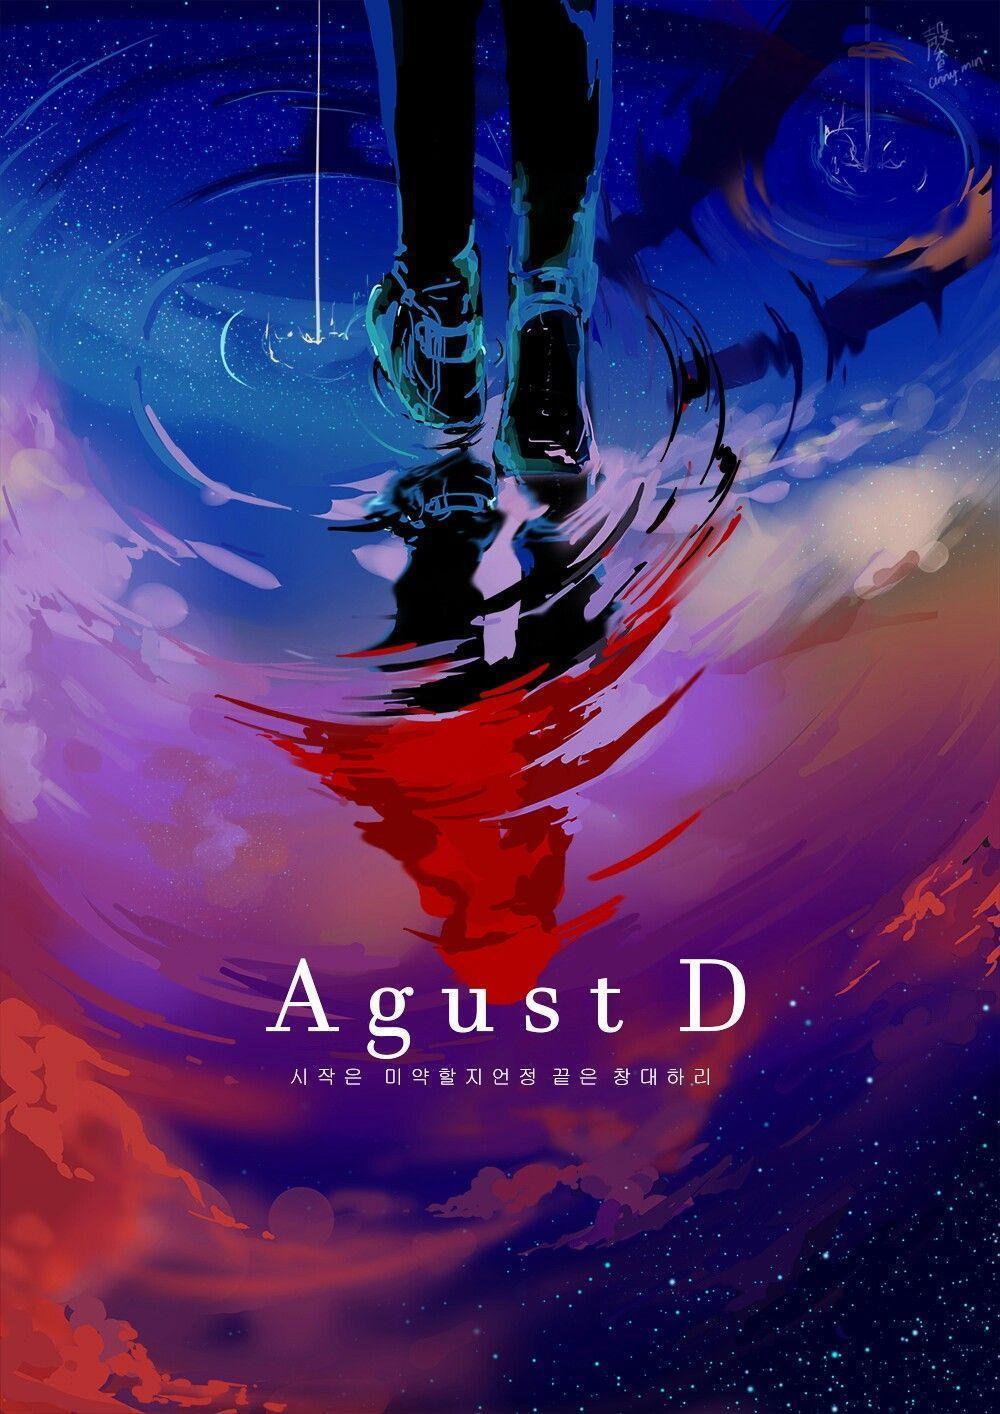 New Agust D Wallpaper Aesthetic 1poin